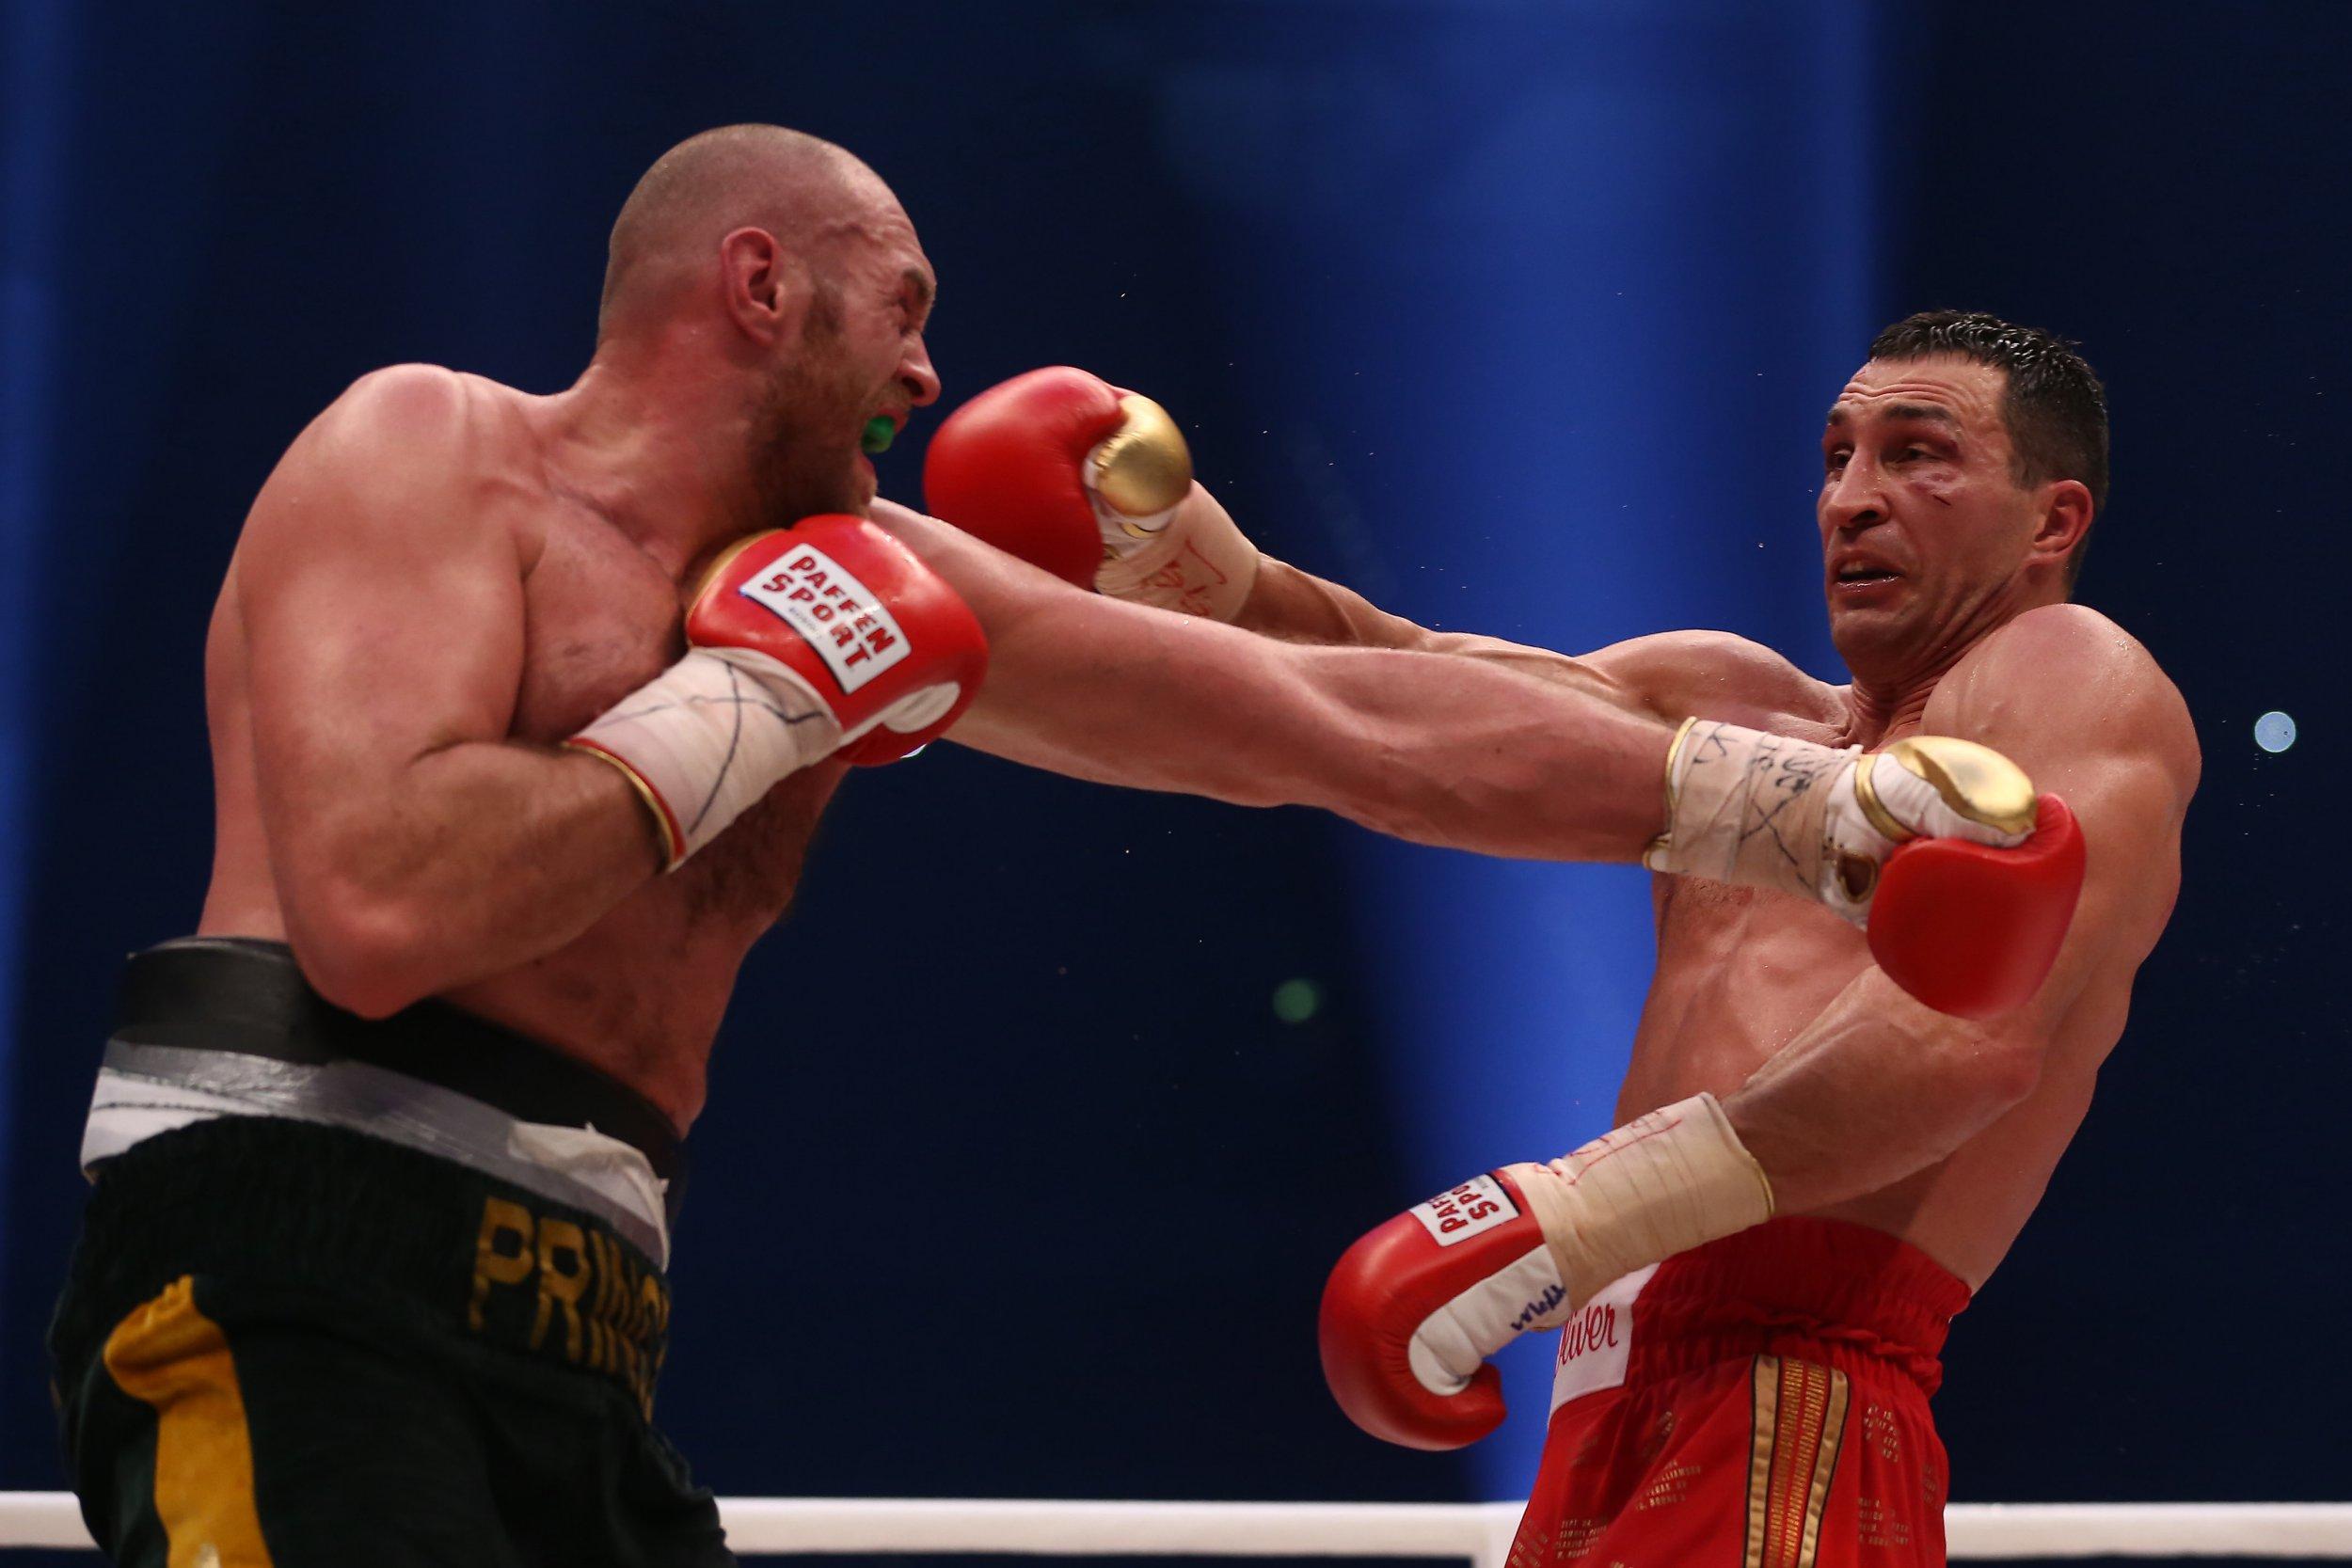 Why Deontay Wilder wants to speak to Wladimir Klitschko about Tyson Fury